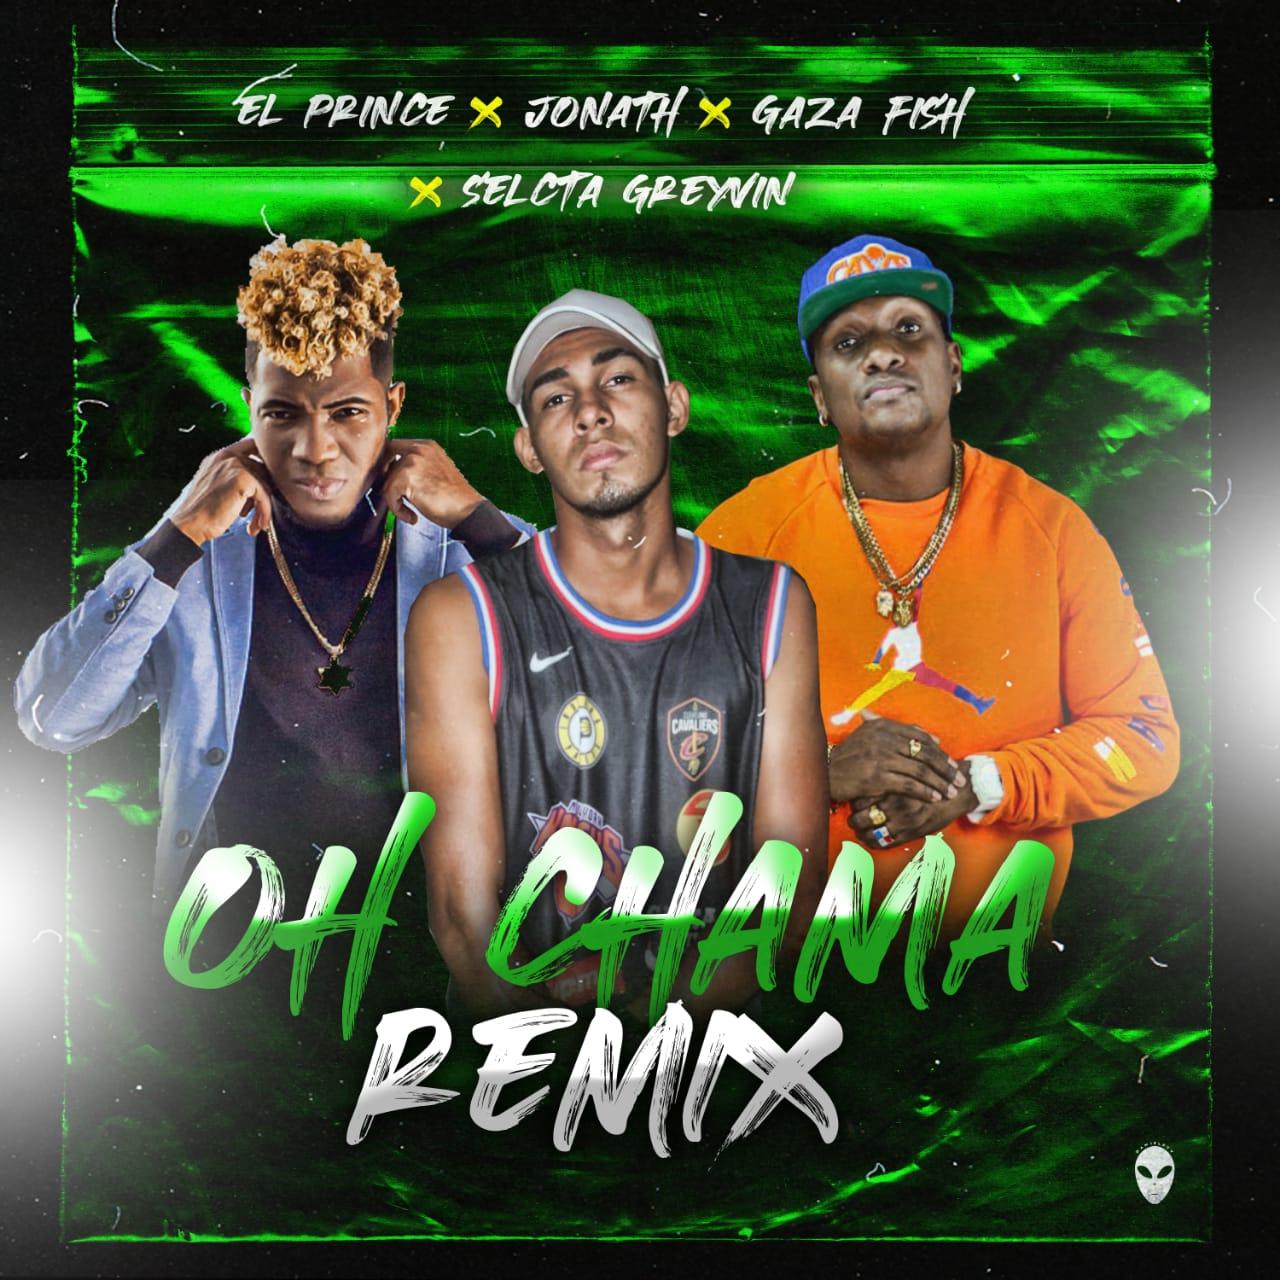 Jonath ft. Gaza Fish, El Prince y Selecta Greyvin - Oh Chama (Remix)